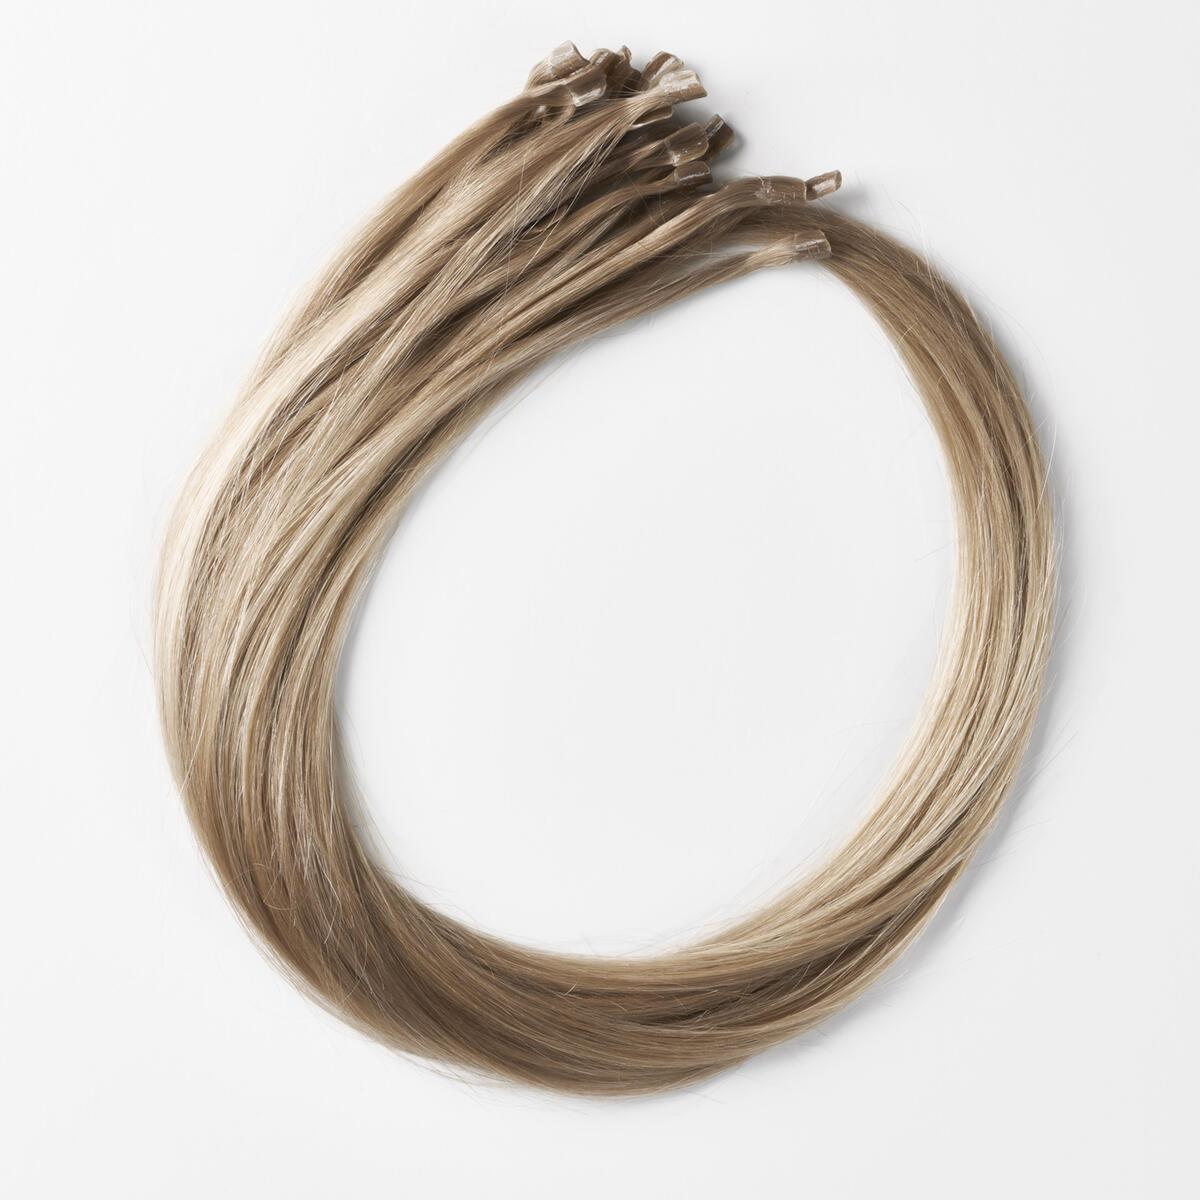 Bondings Premium Glatt B7.5/10.7 Sandy Blonde Balayage 50 cm